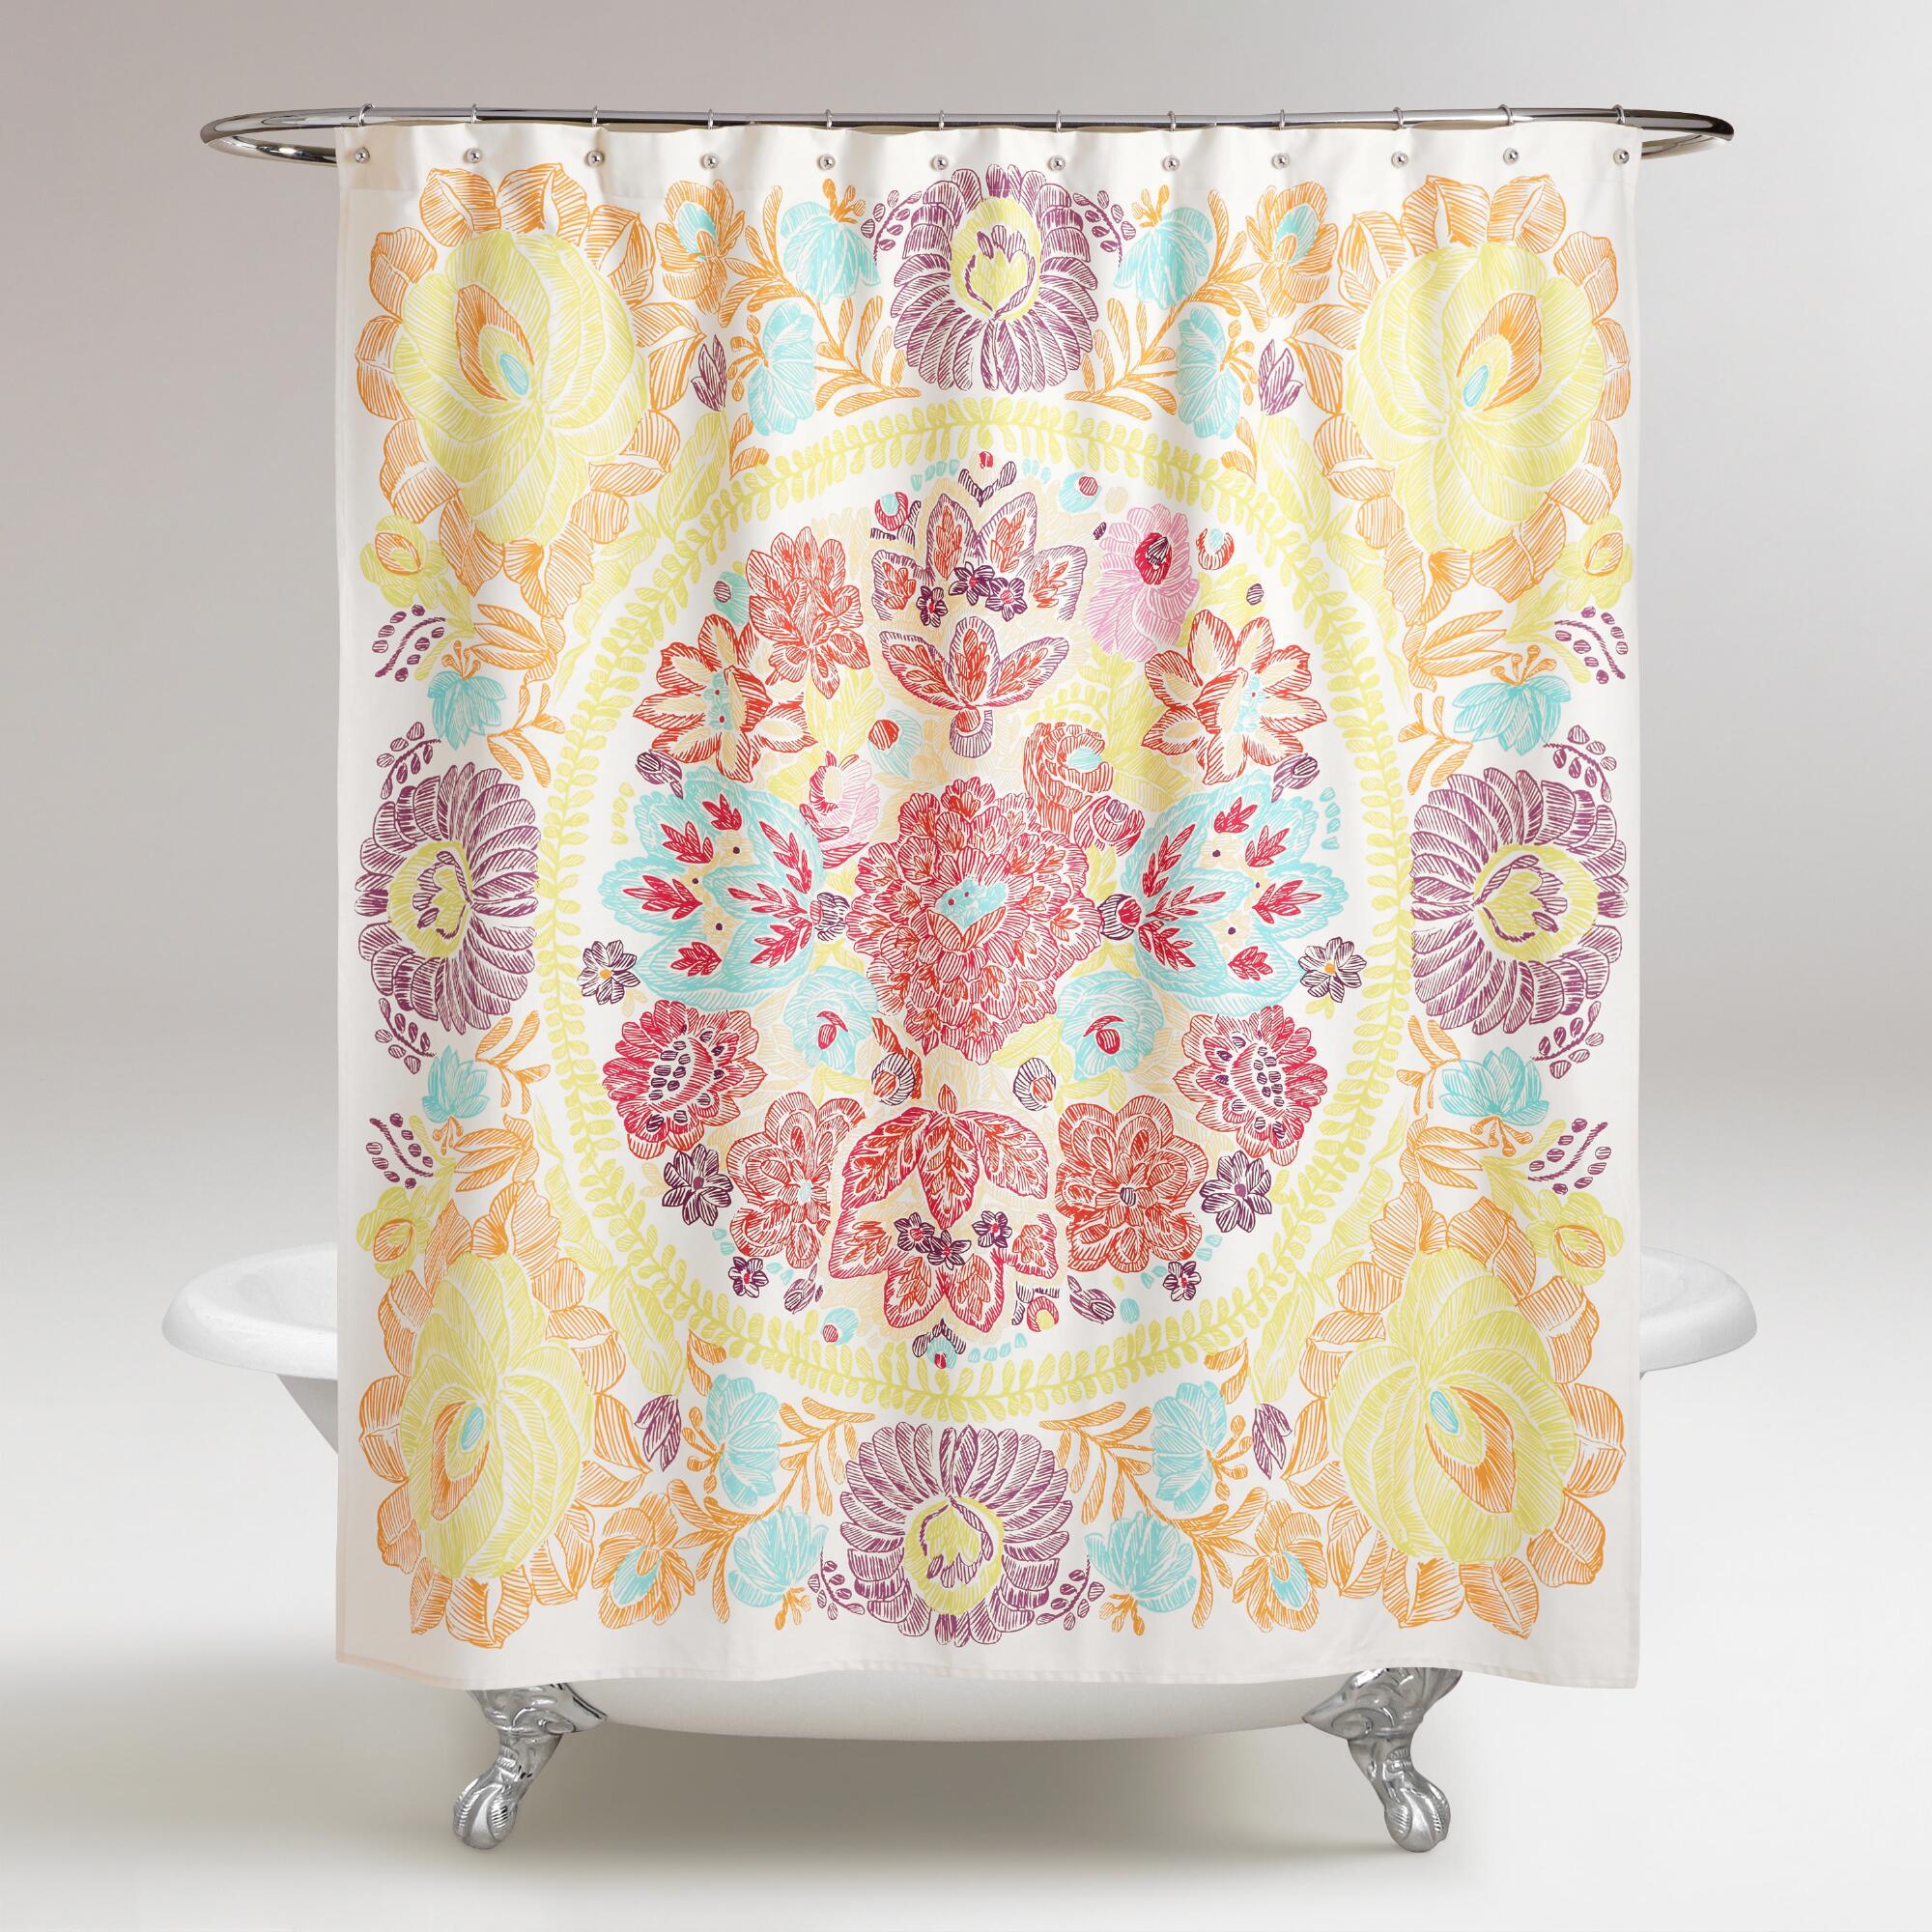 Rachel Shower Curtain from Worldmarket.com.jpg